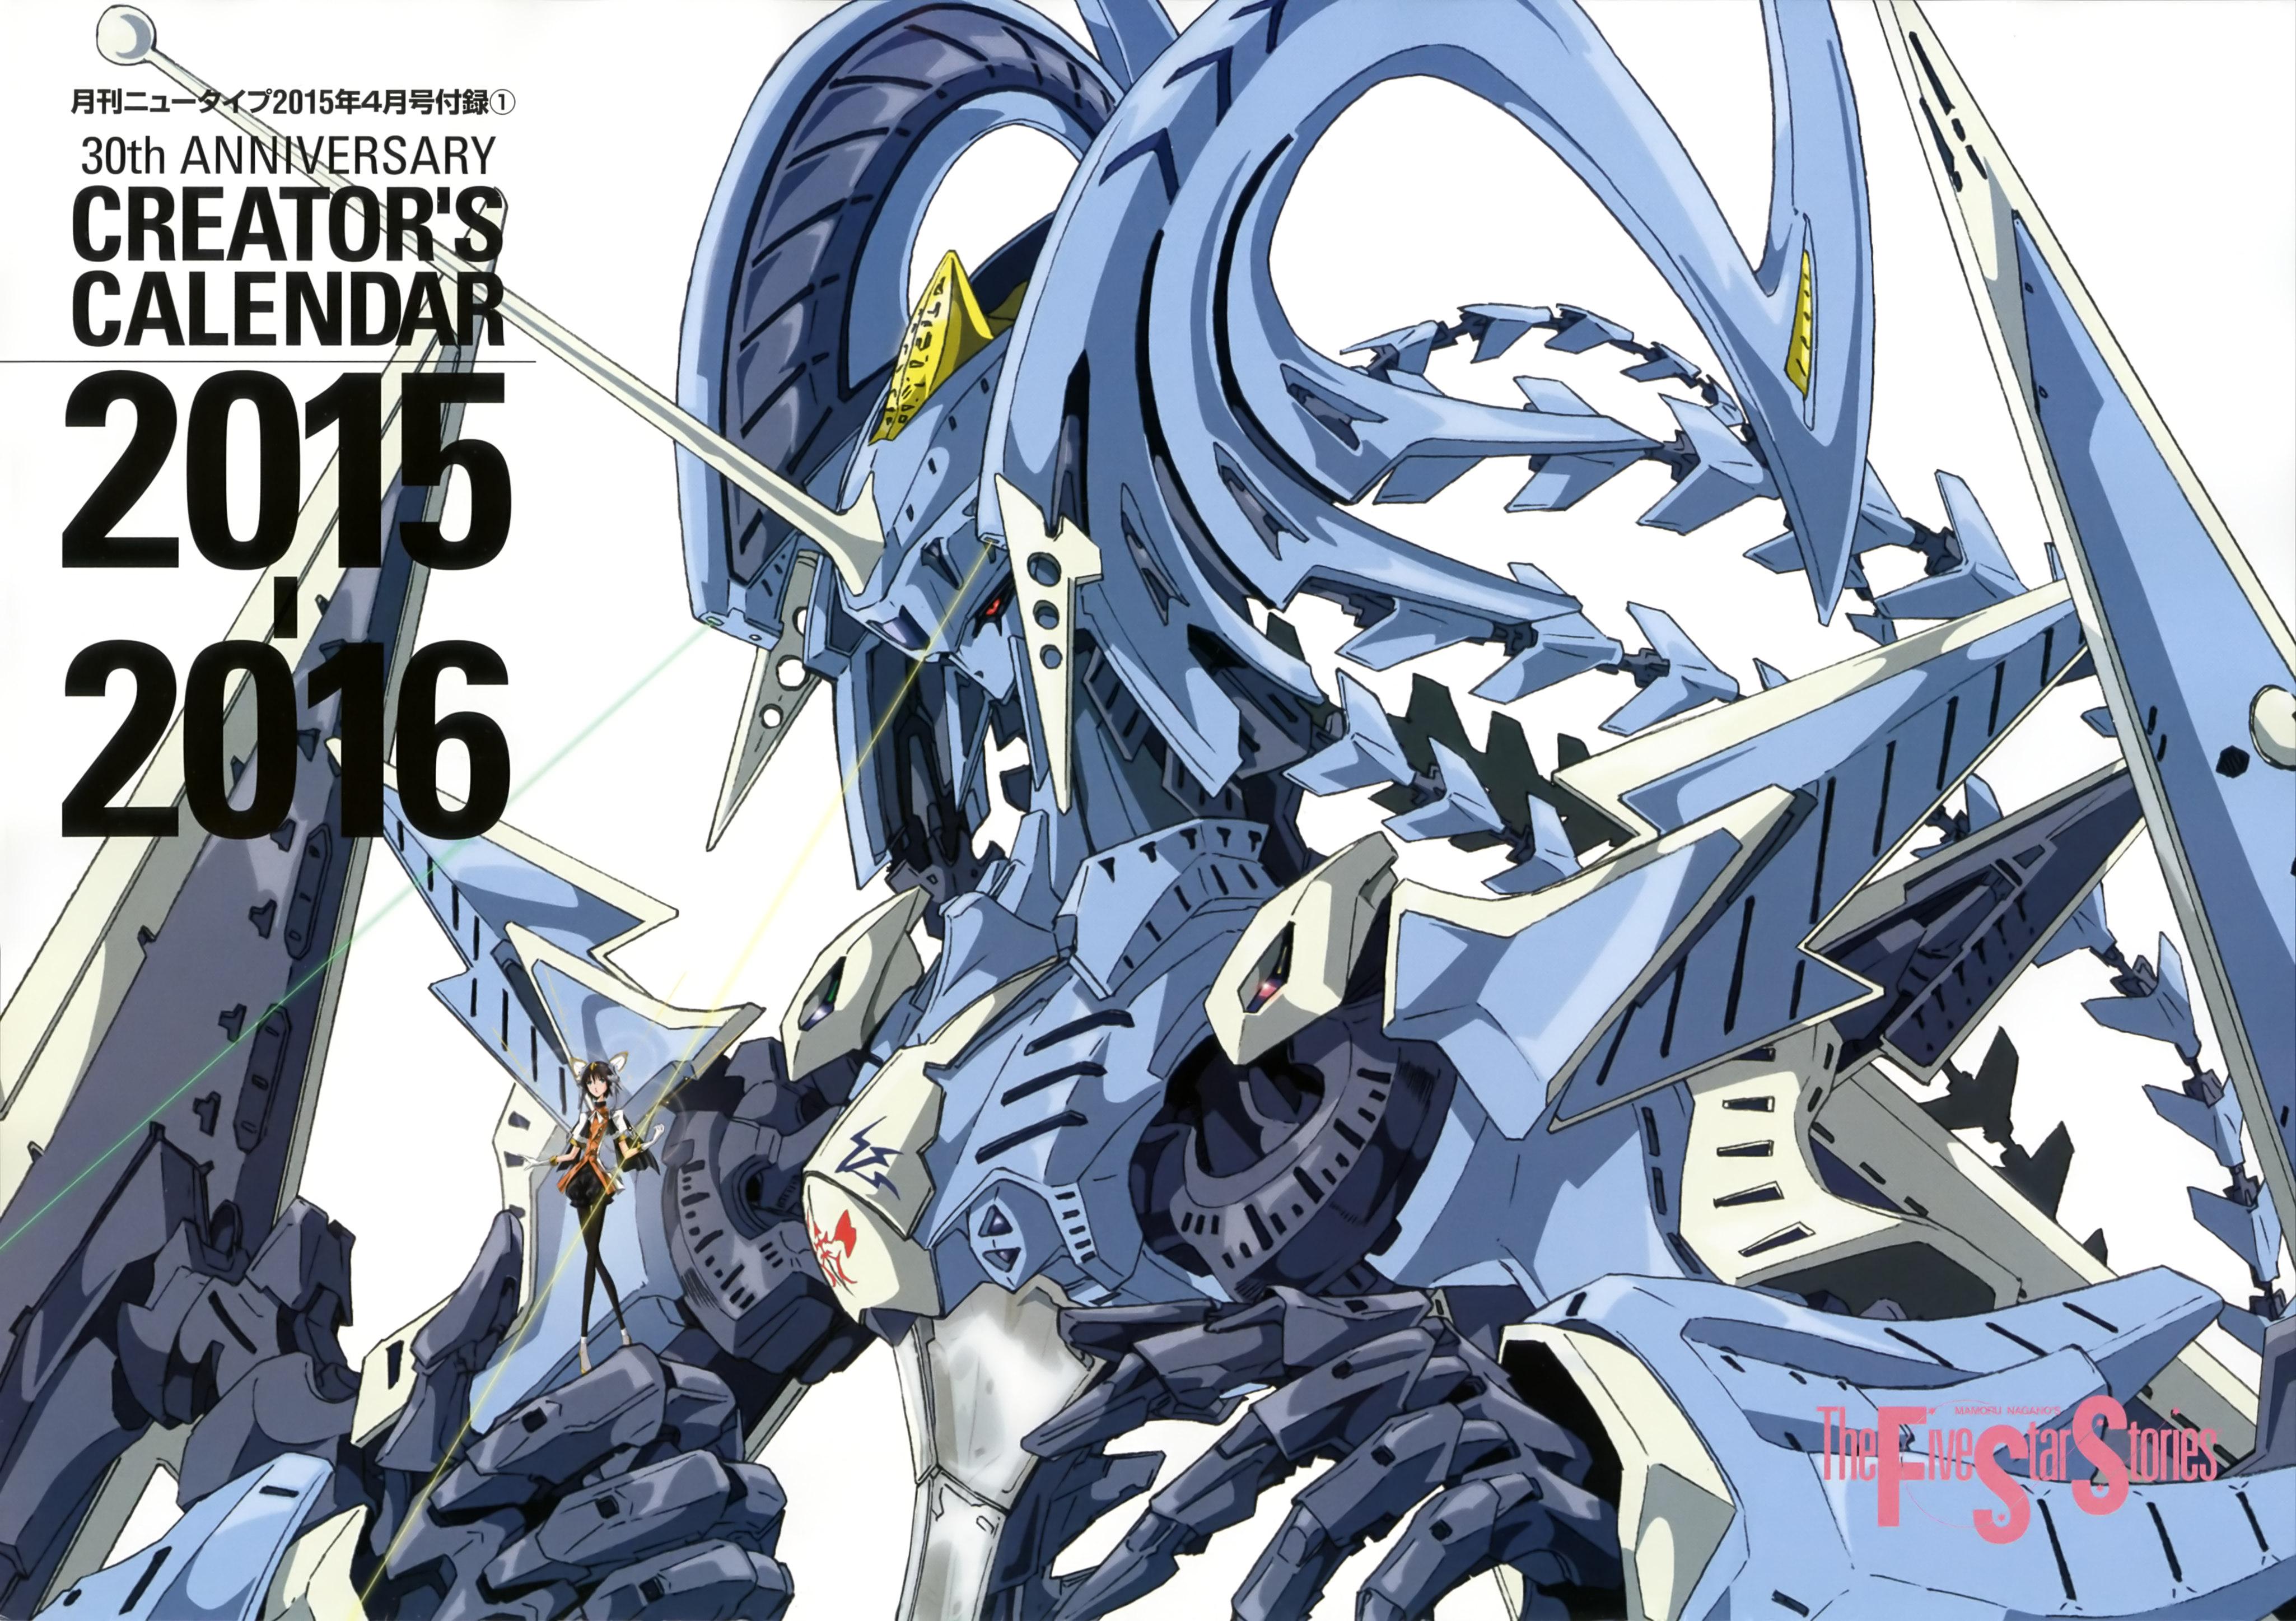 Newtype 30th Anniversary CREATOR'S CALENDAR 2015-2016 five star stories